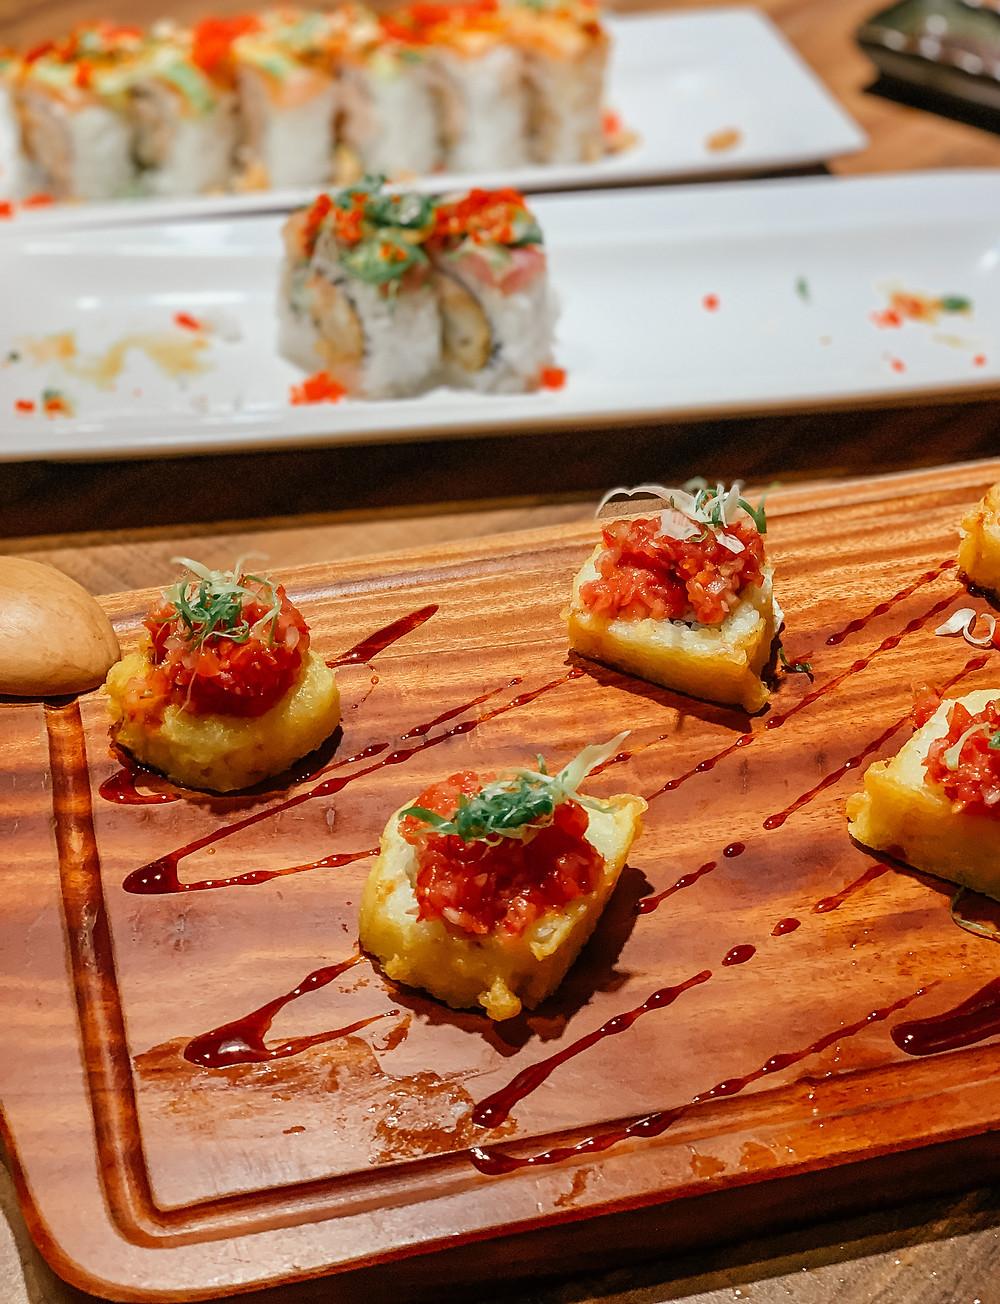 NCISushi 德相美式加州壽司 | Taipei Sushi Restaurant | A Style Alike